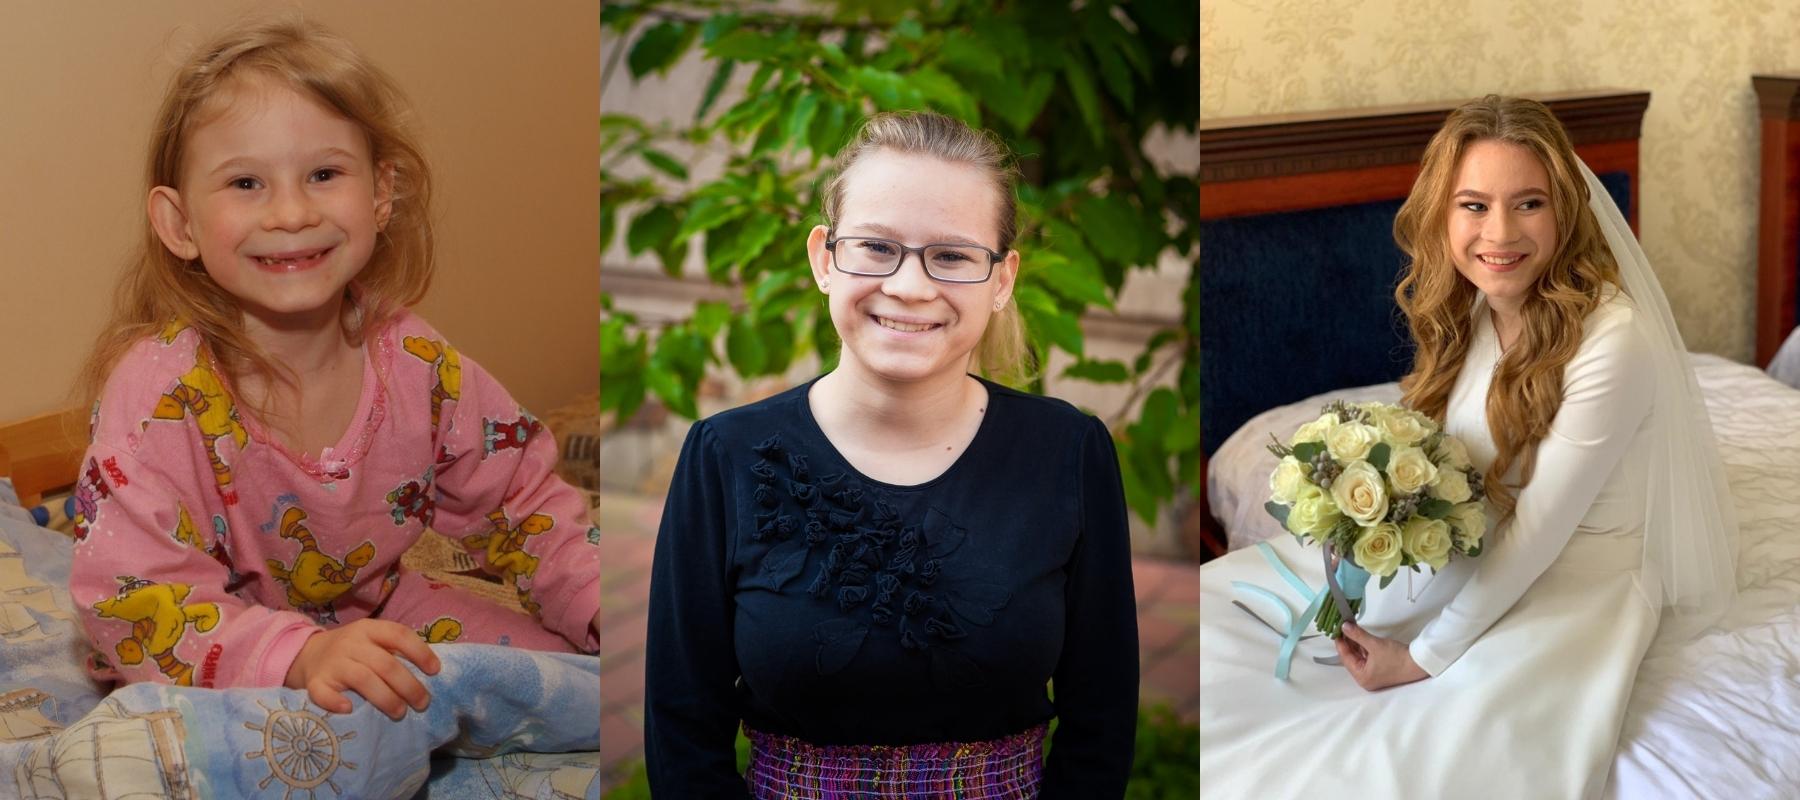 Joods weesmeisje Vera Oekraïne getrouwd